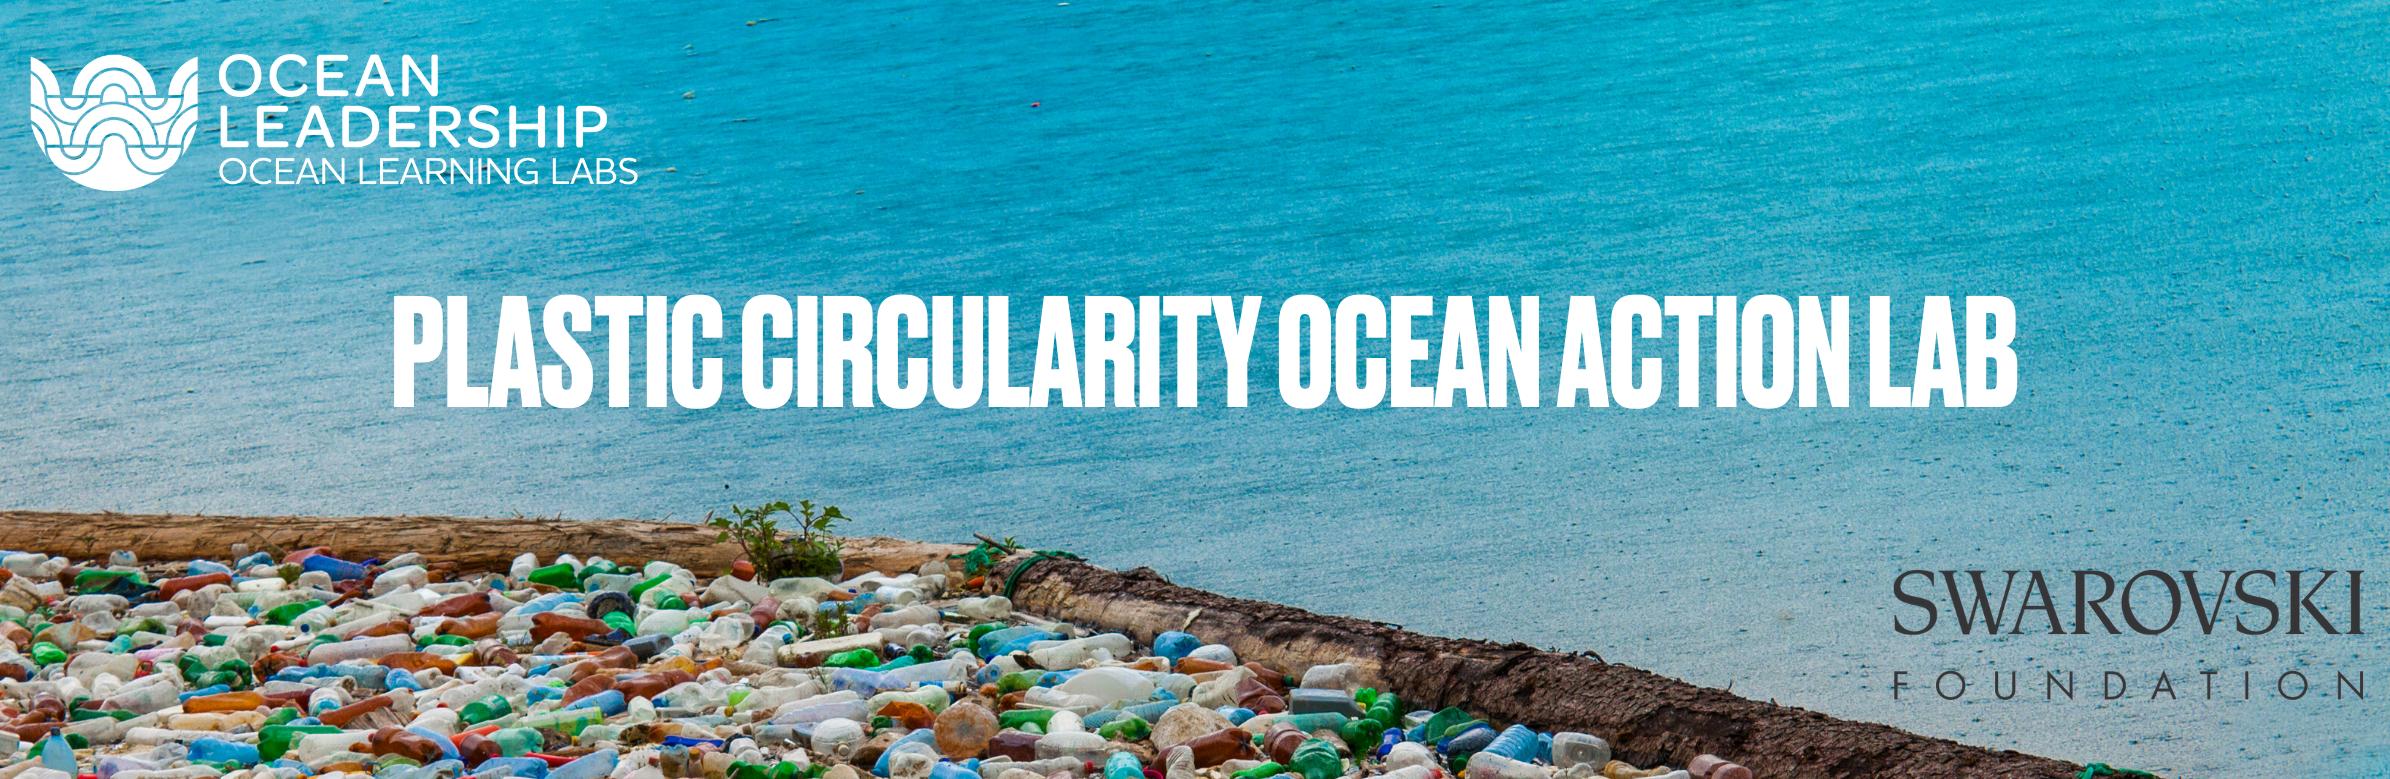 Plastic Circularity Ocean Action Lab